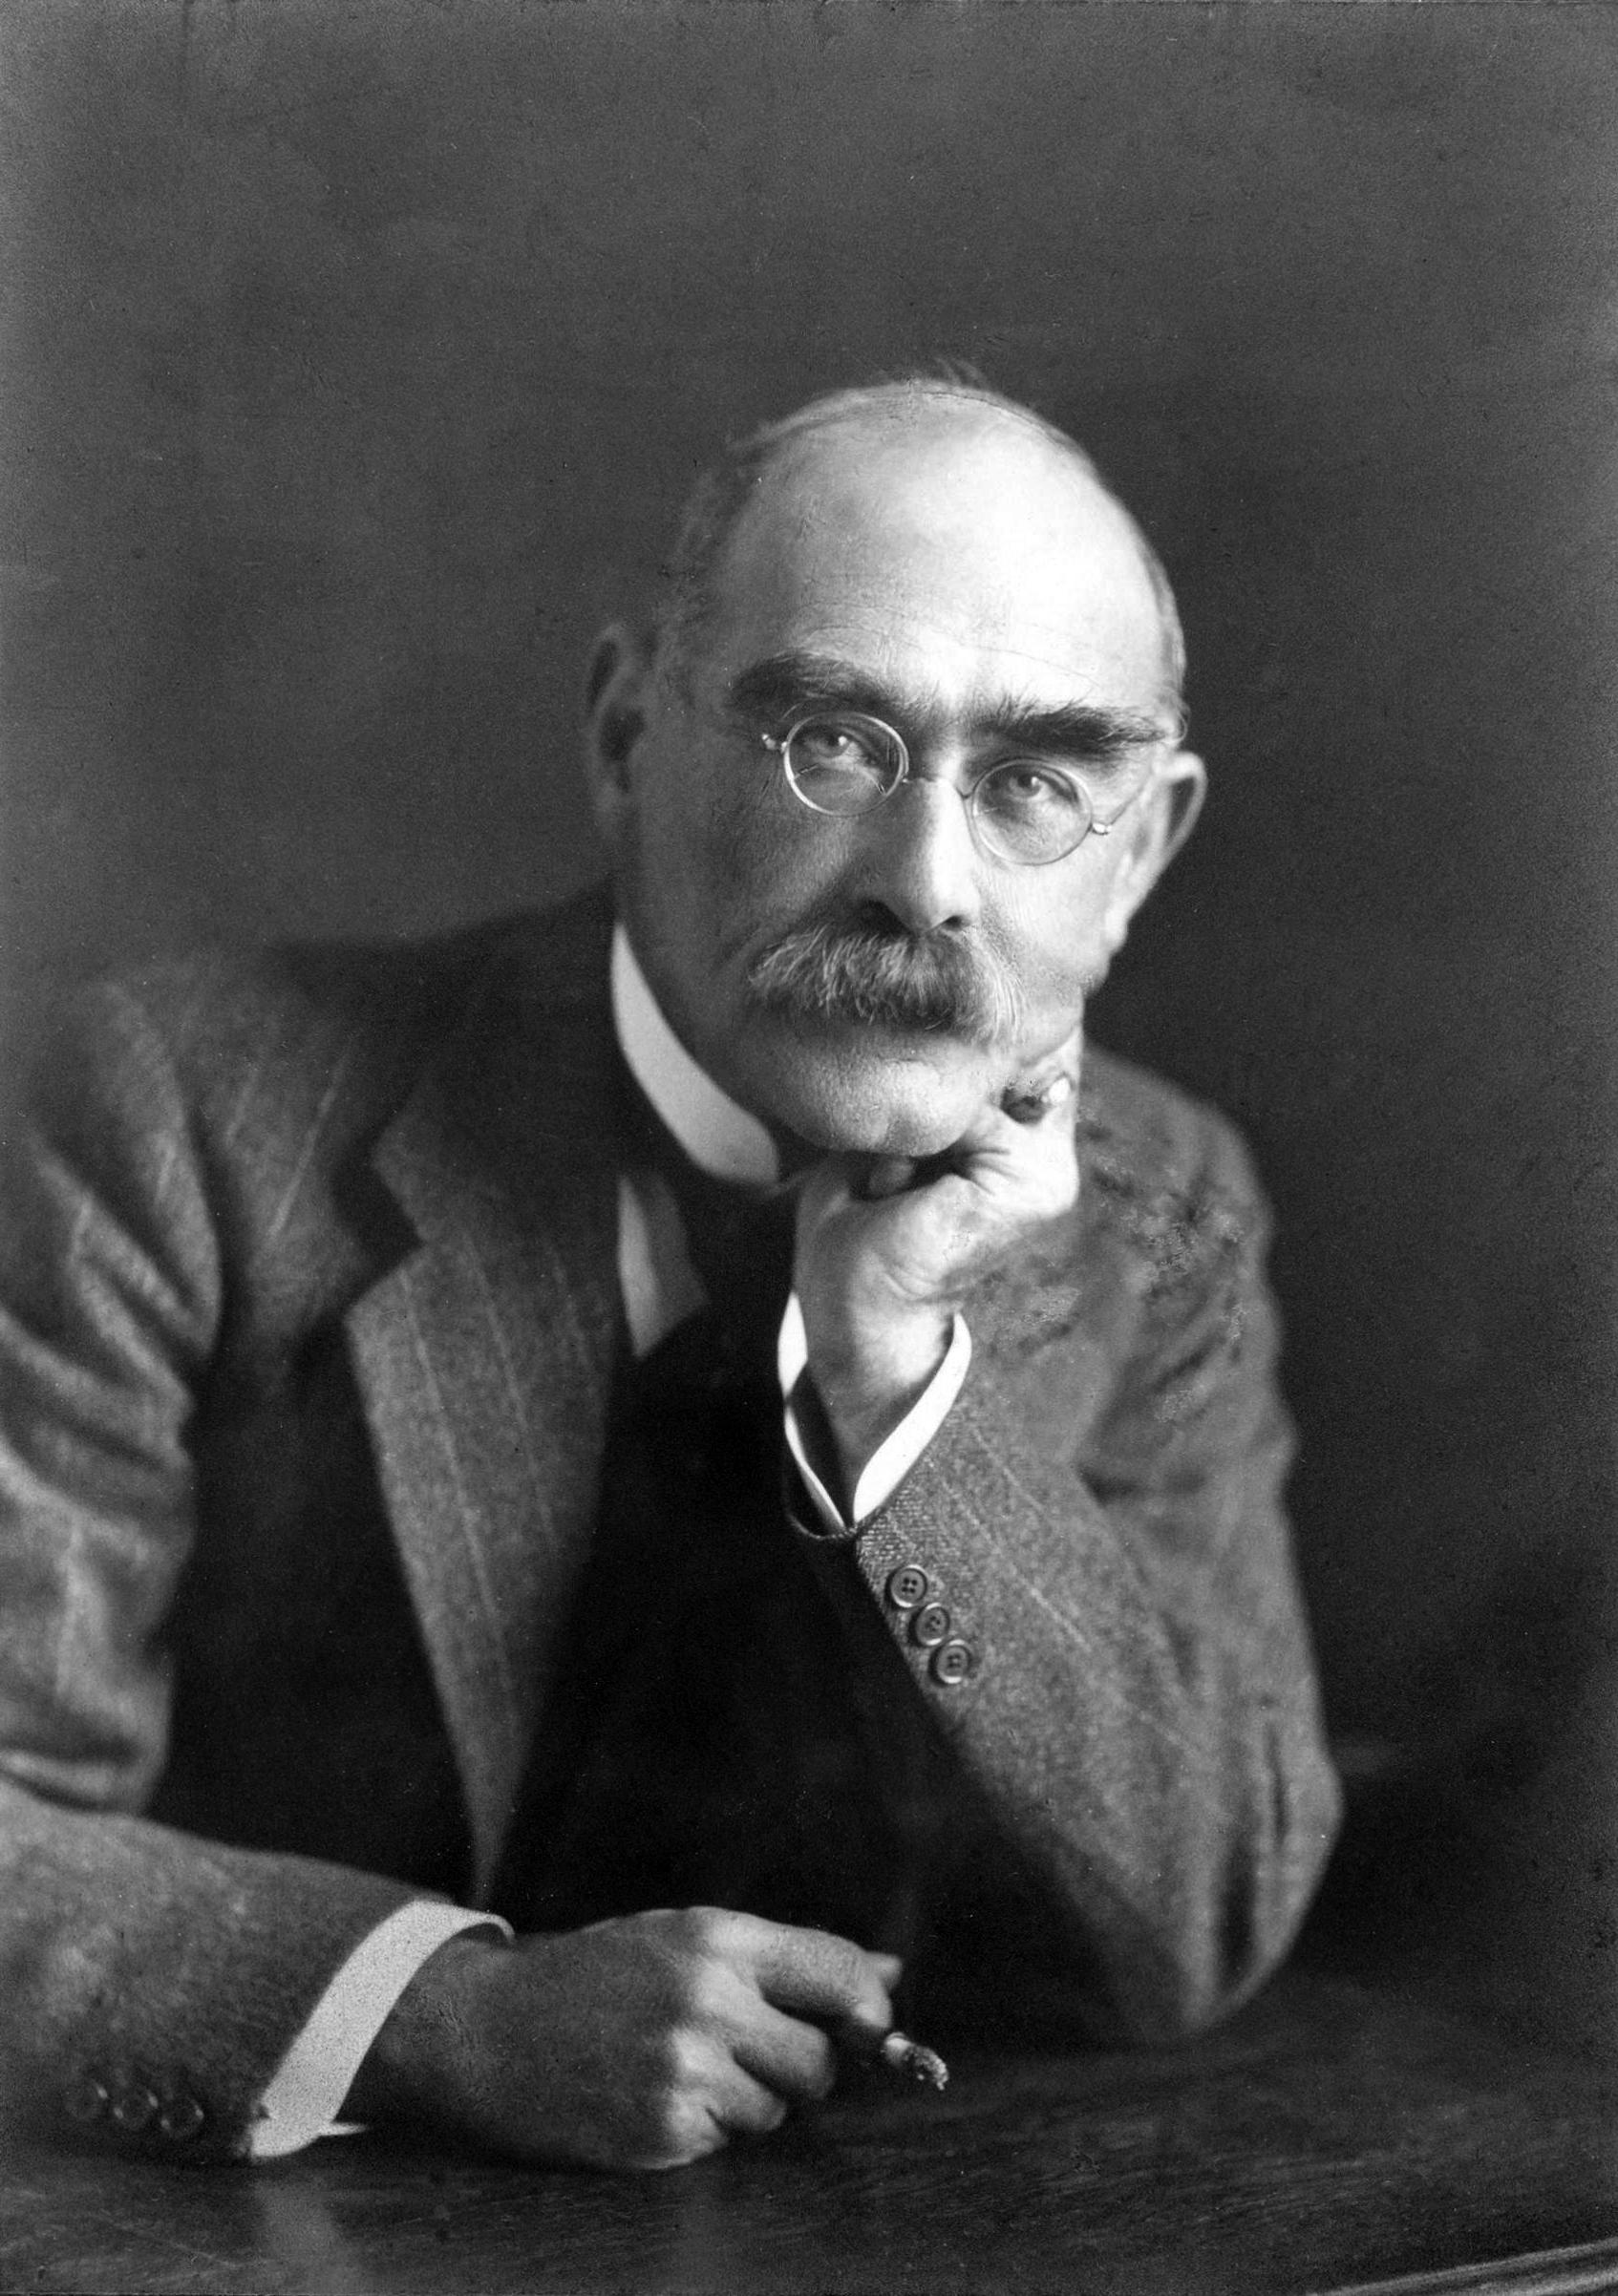 Depiction of Rudyard Kipling